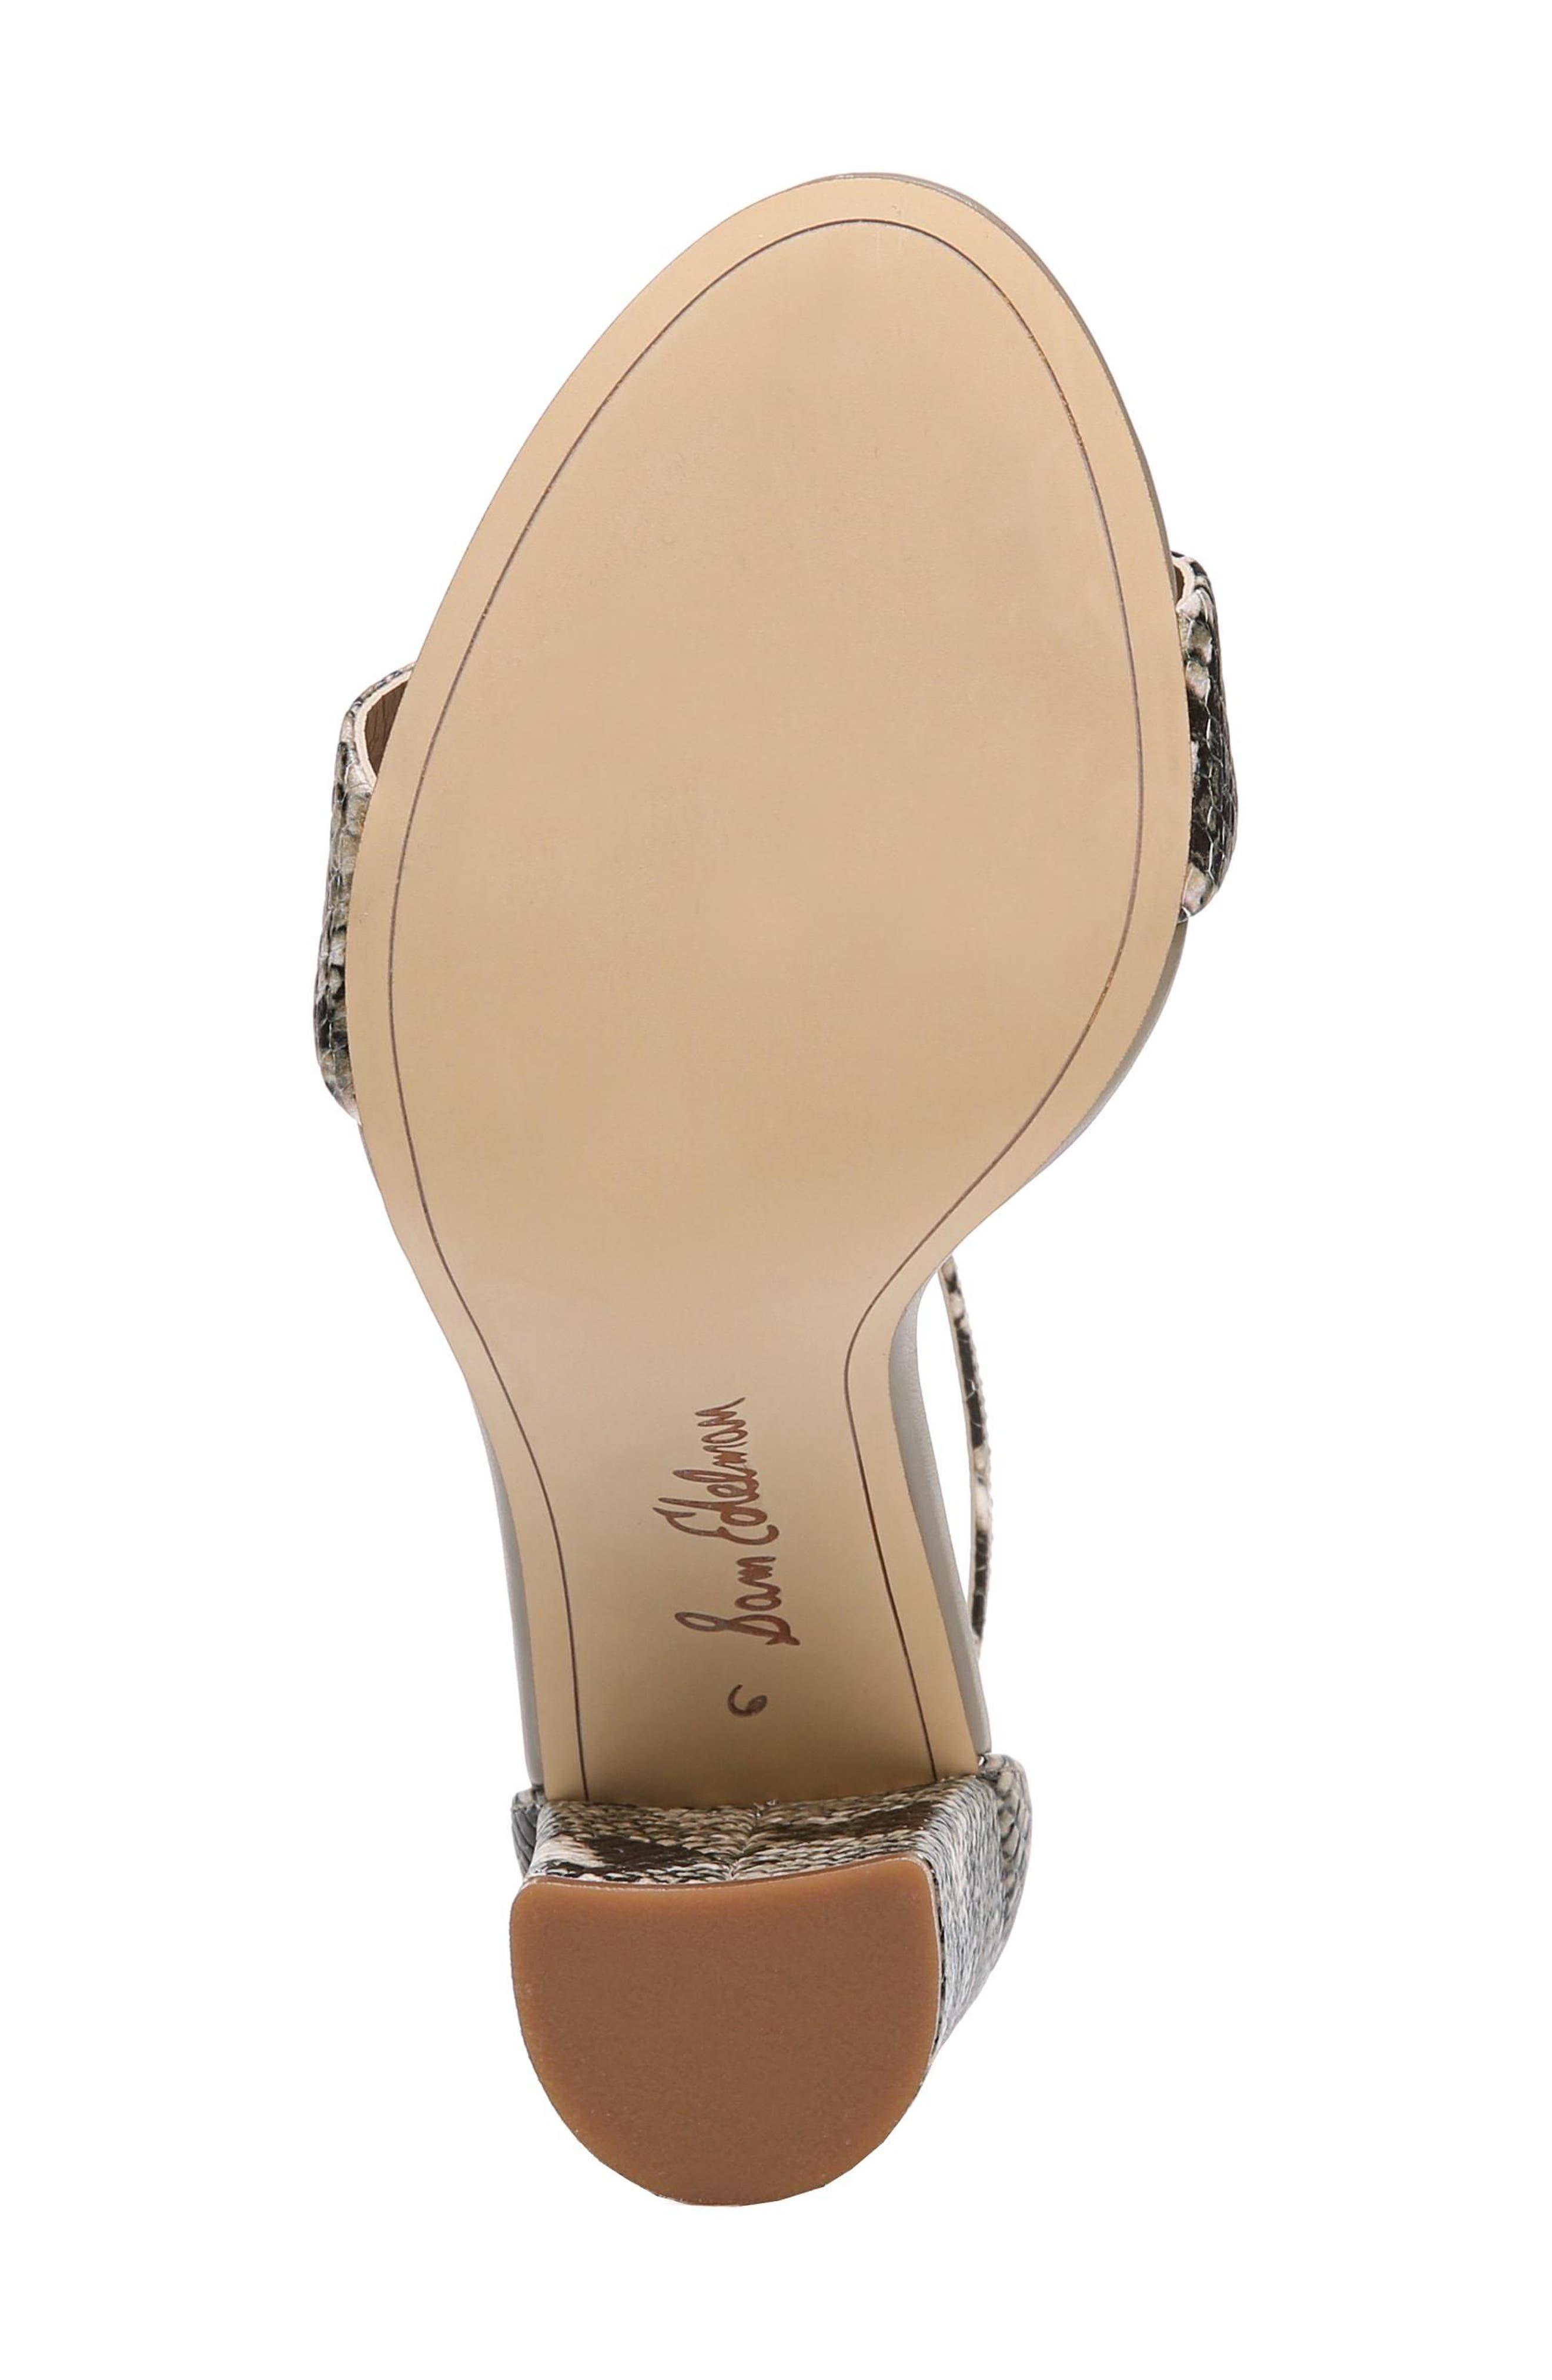 Yaro Ankle Strap Sandal,                             Alternate thumbnail 4, color,                             Natural Snake Print Leather